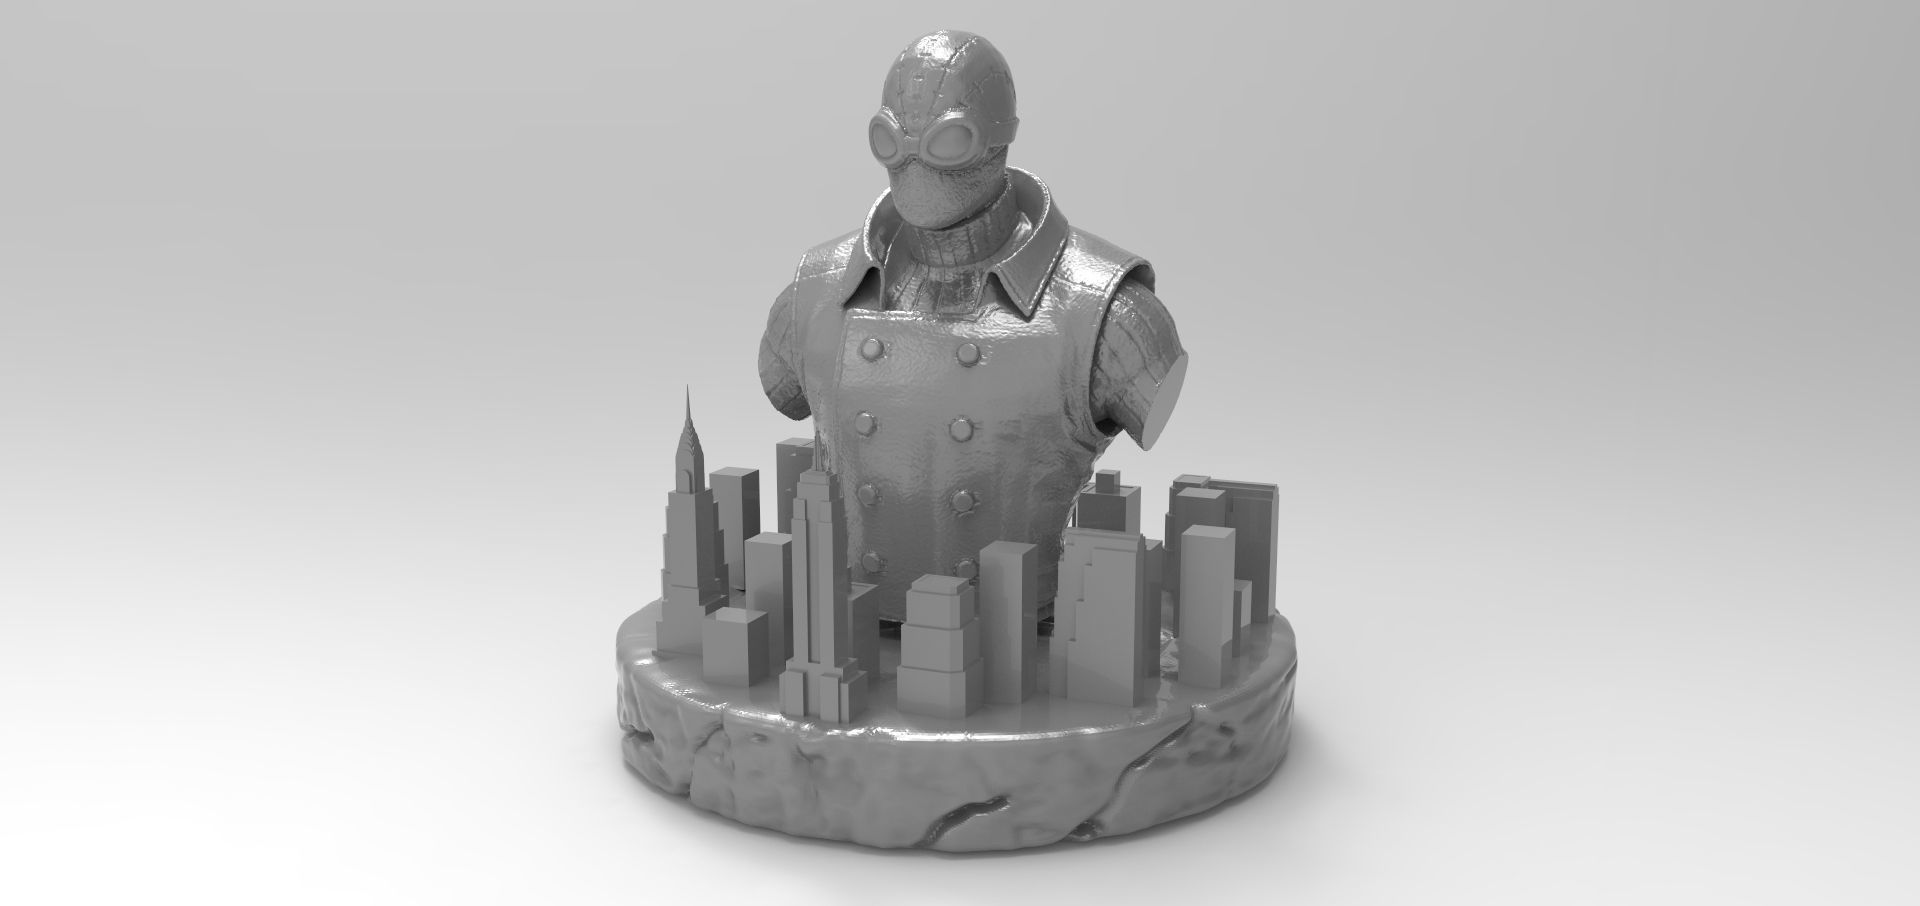 spider-man noir bust 3d printable model | cgtrader